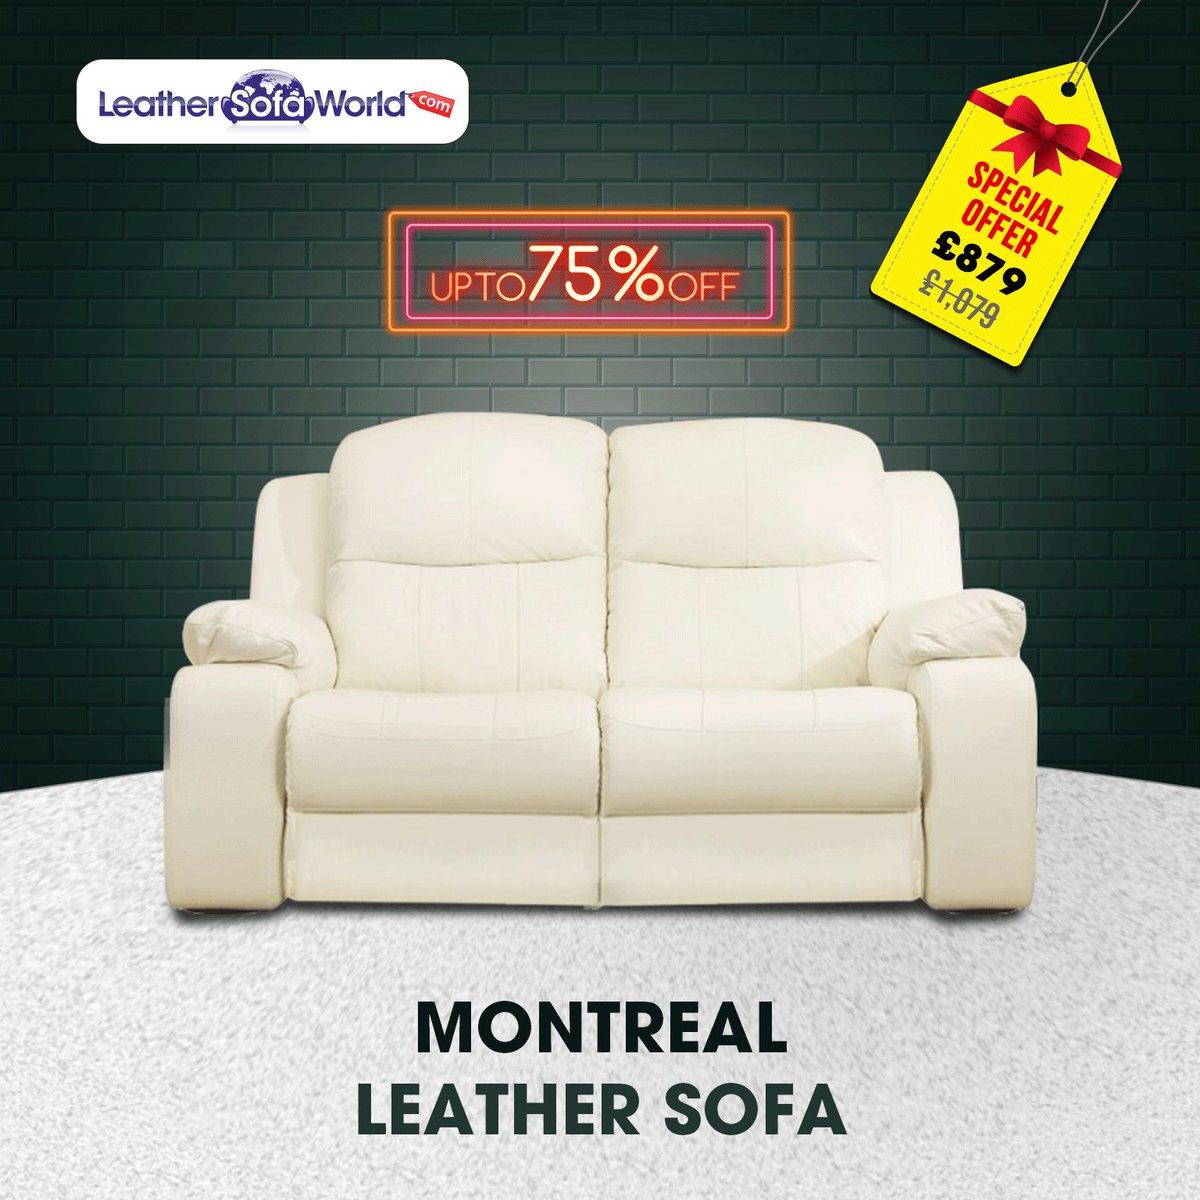 Leather Sofa World on Twitter: \